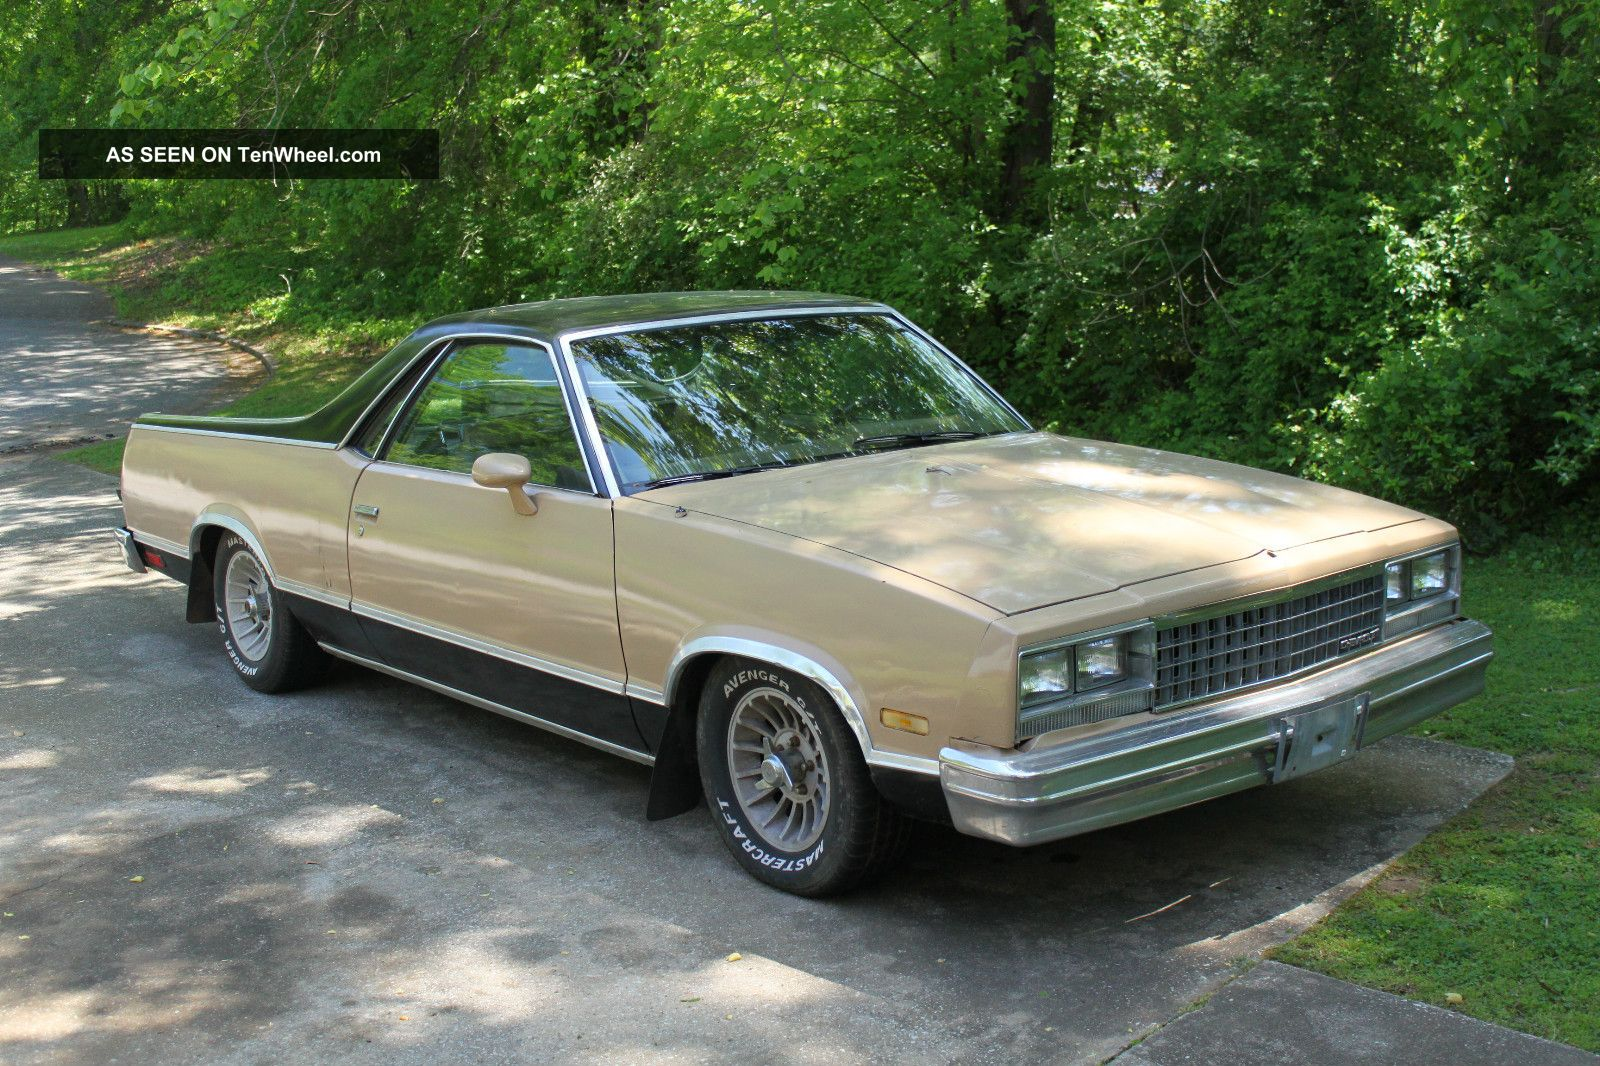 1985 Chevrolet El Camino Conquista 305 V8 Bill Of Only No